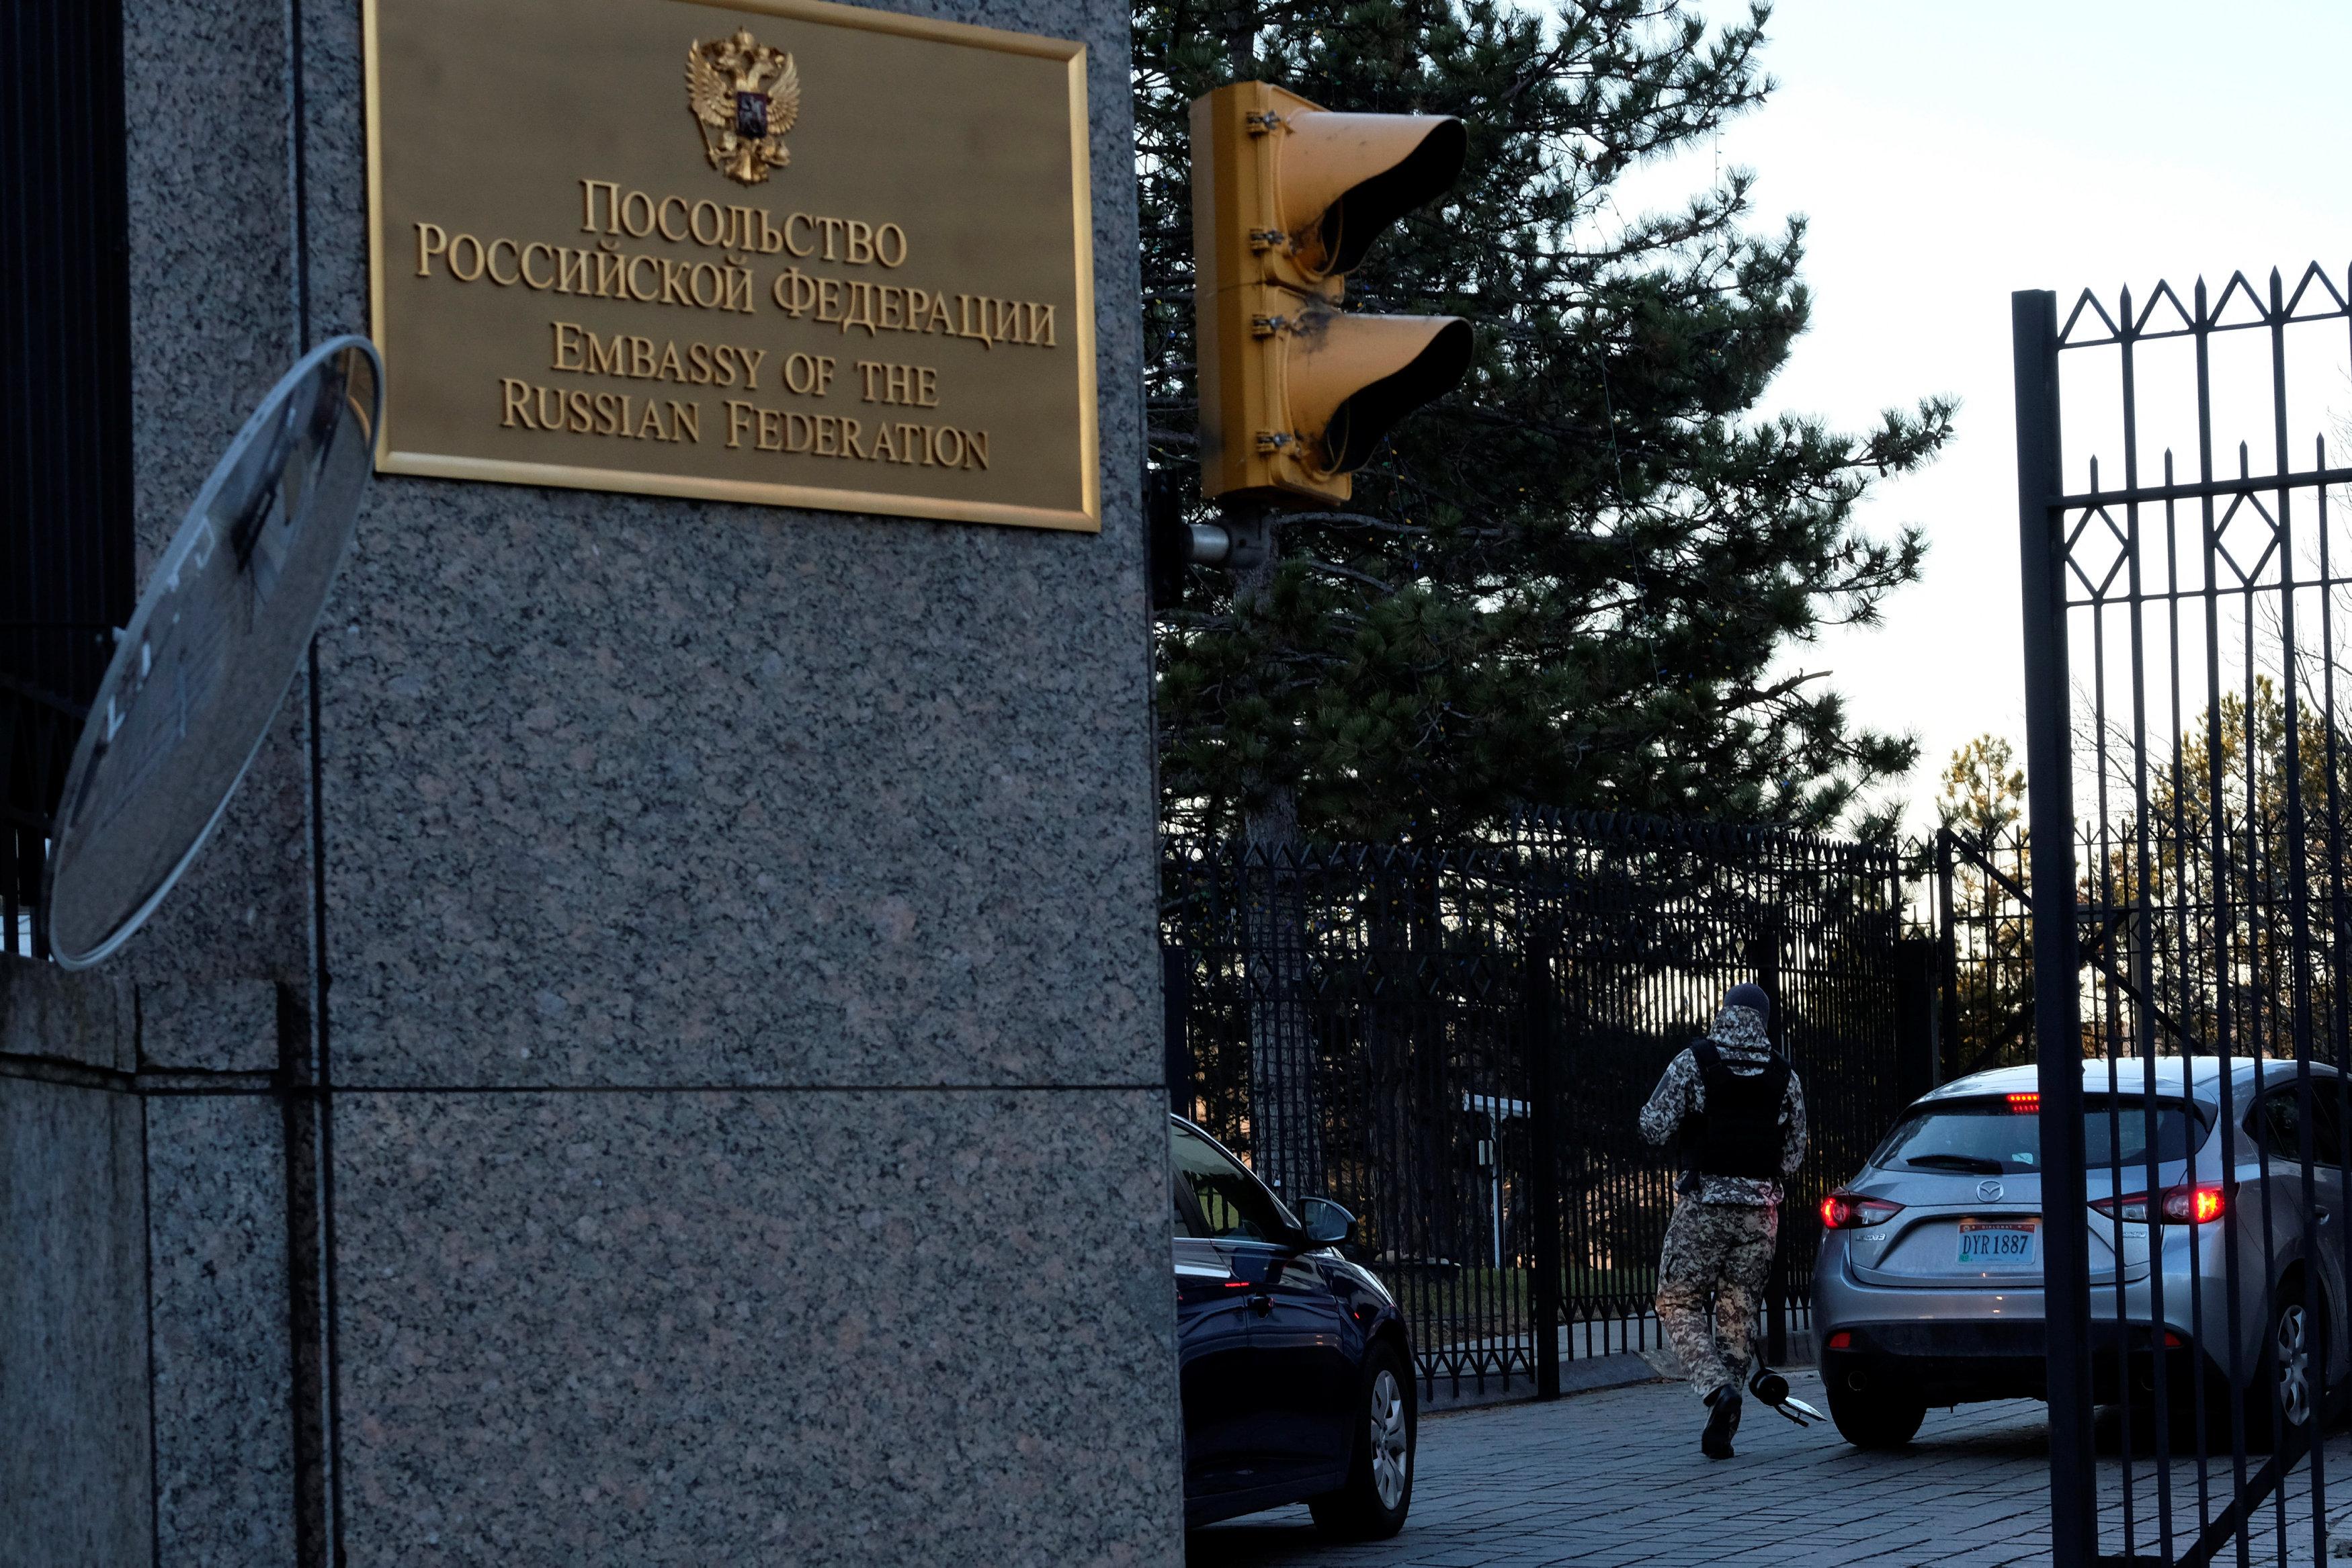 A guard screens cars entering the Russian embassy on Wisconsin Avenue in Washington, U.S.